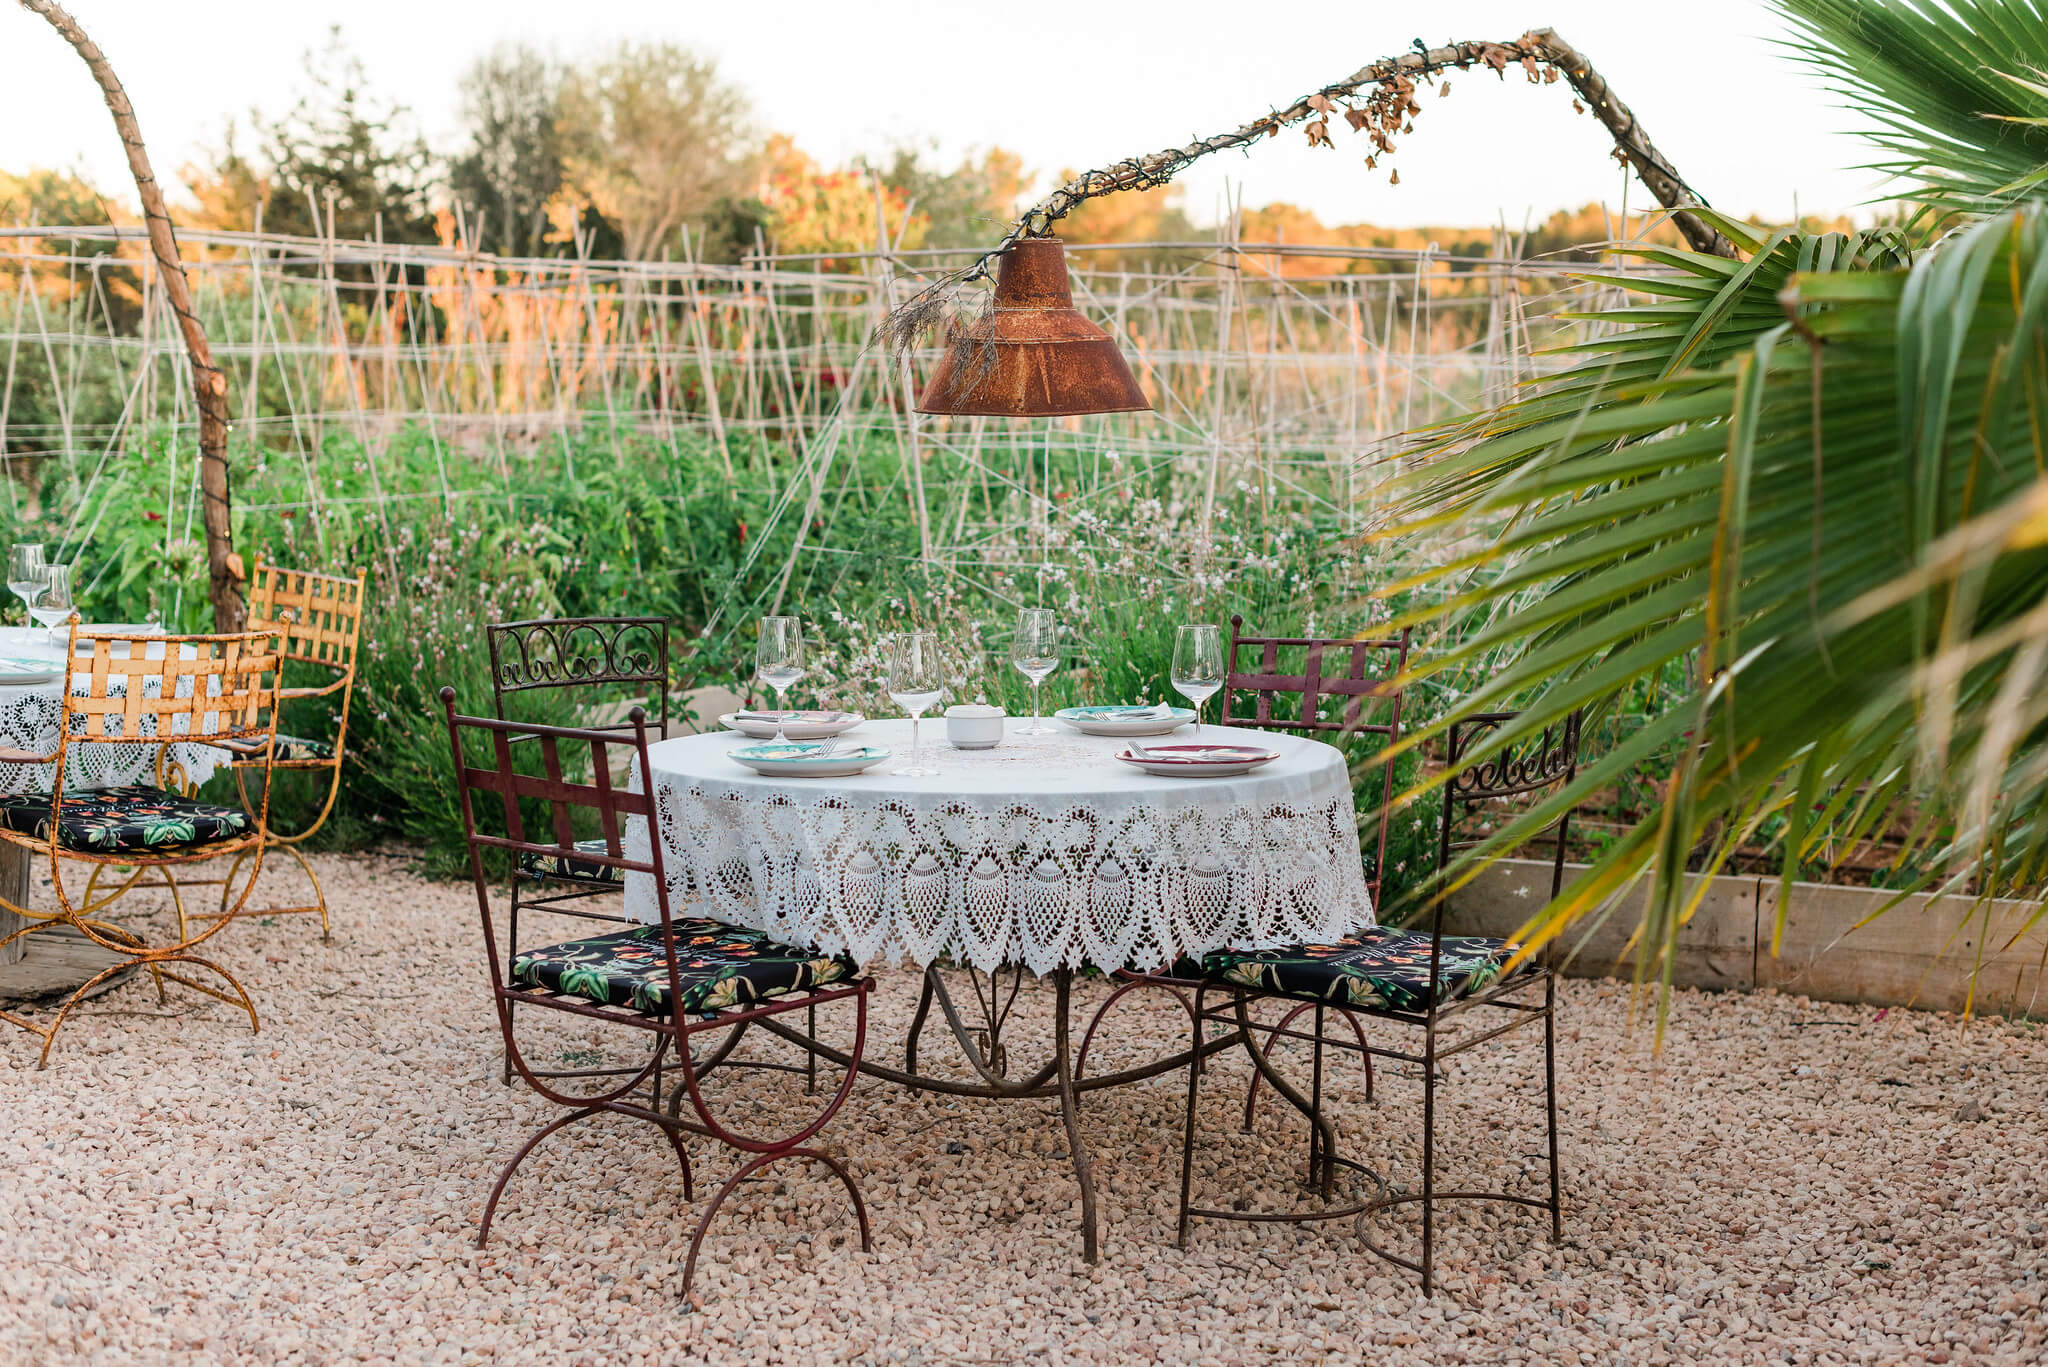 https://www.white-ibiza.com/wp-content/uploads/2020/03/formentera-restaurants-a-mi-manera-2020-07.jpg